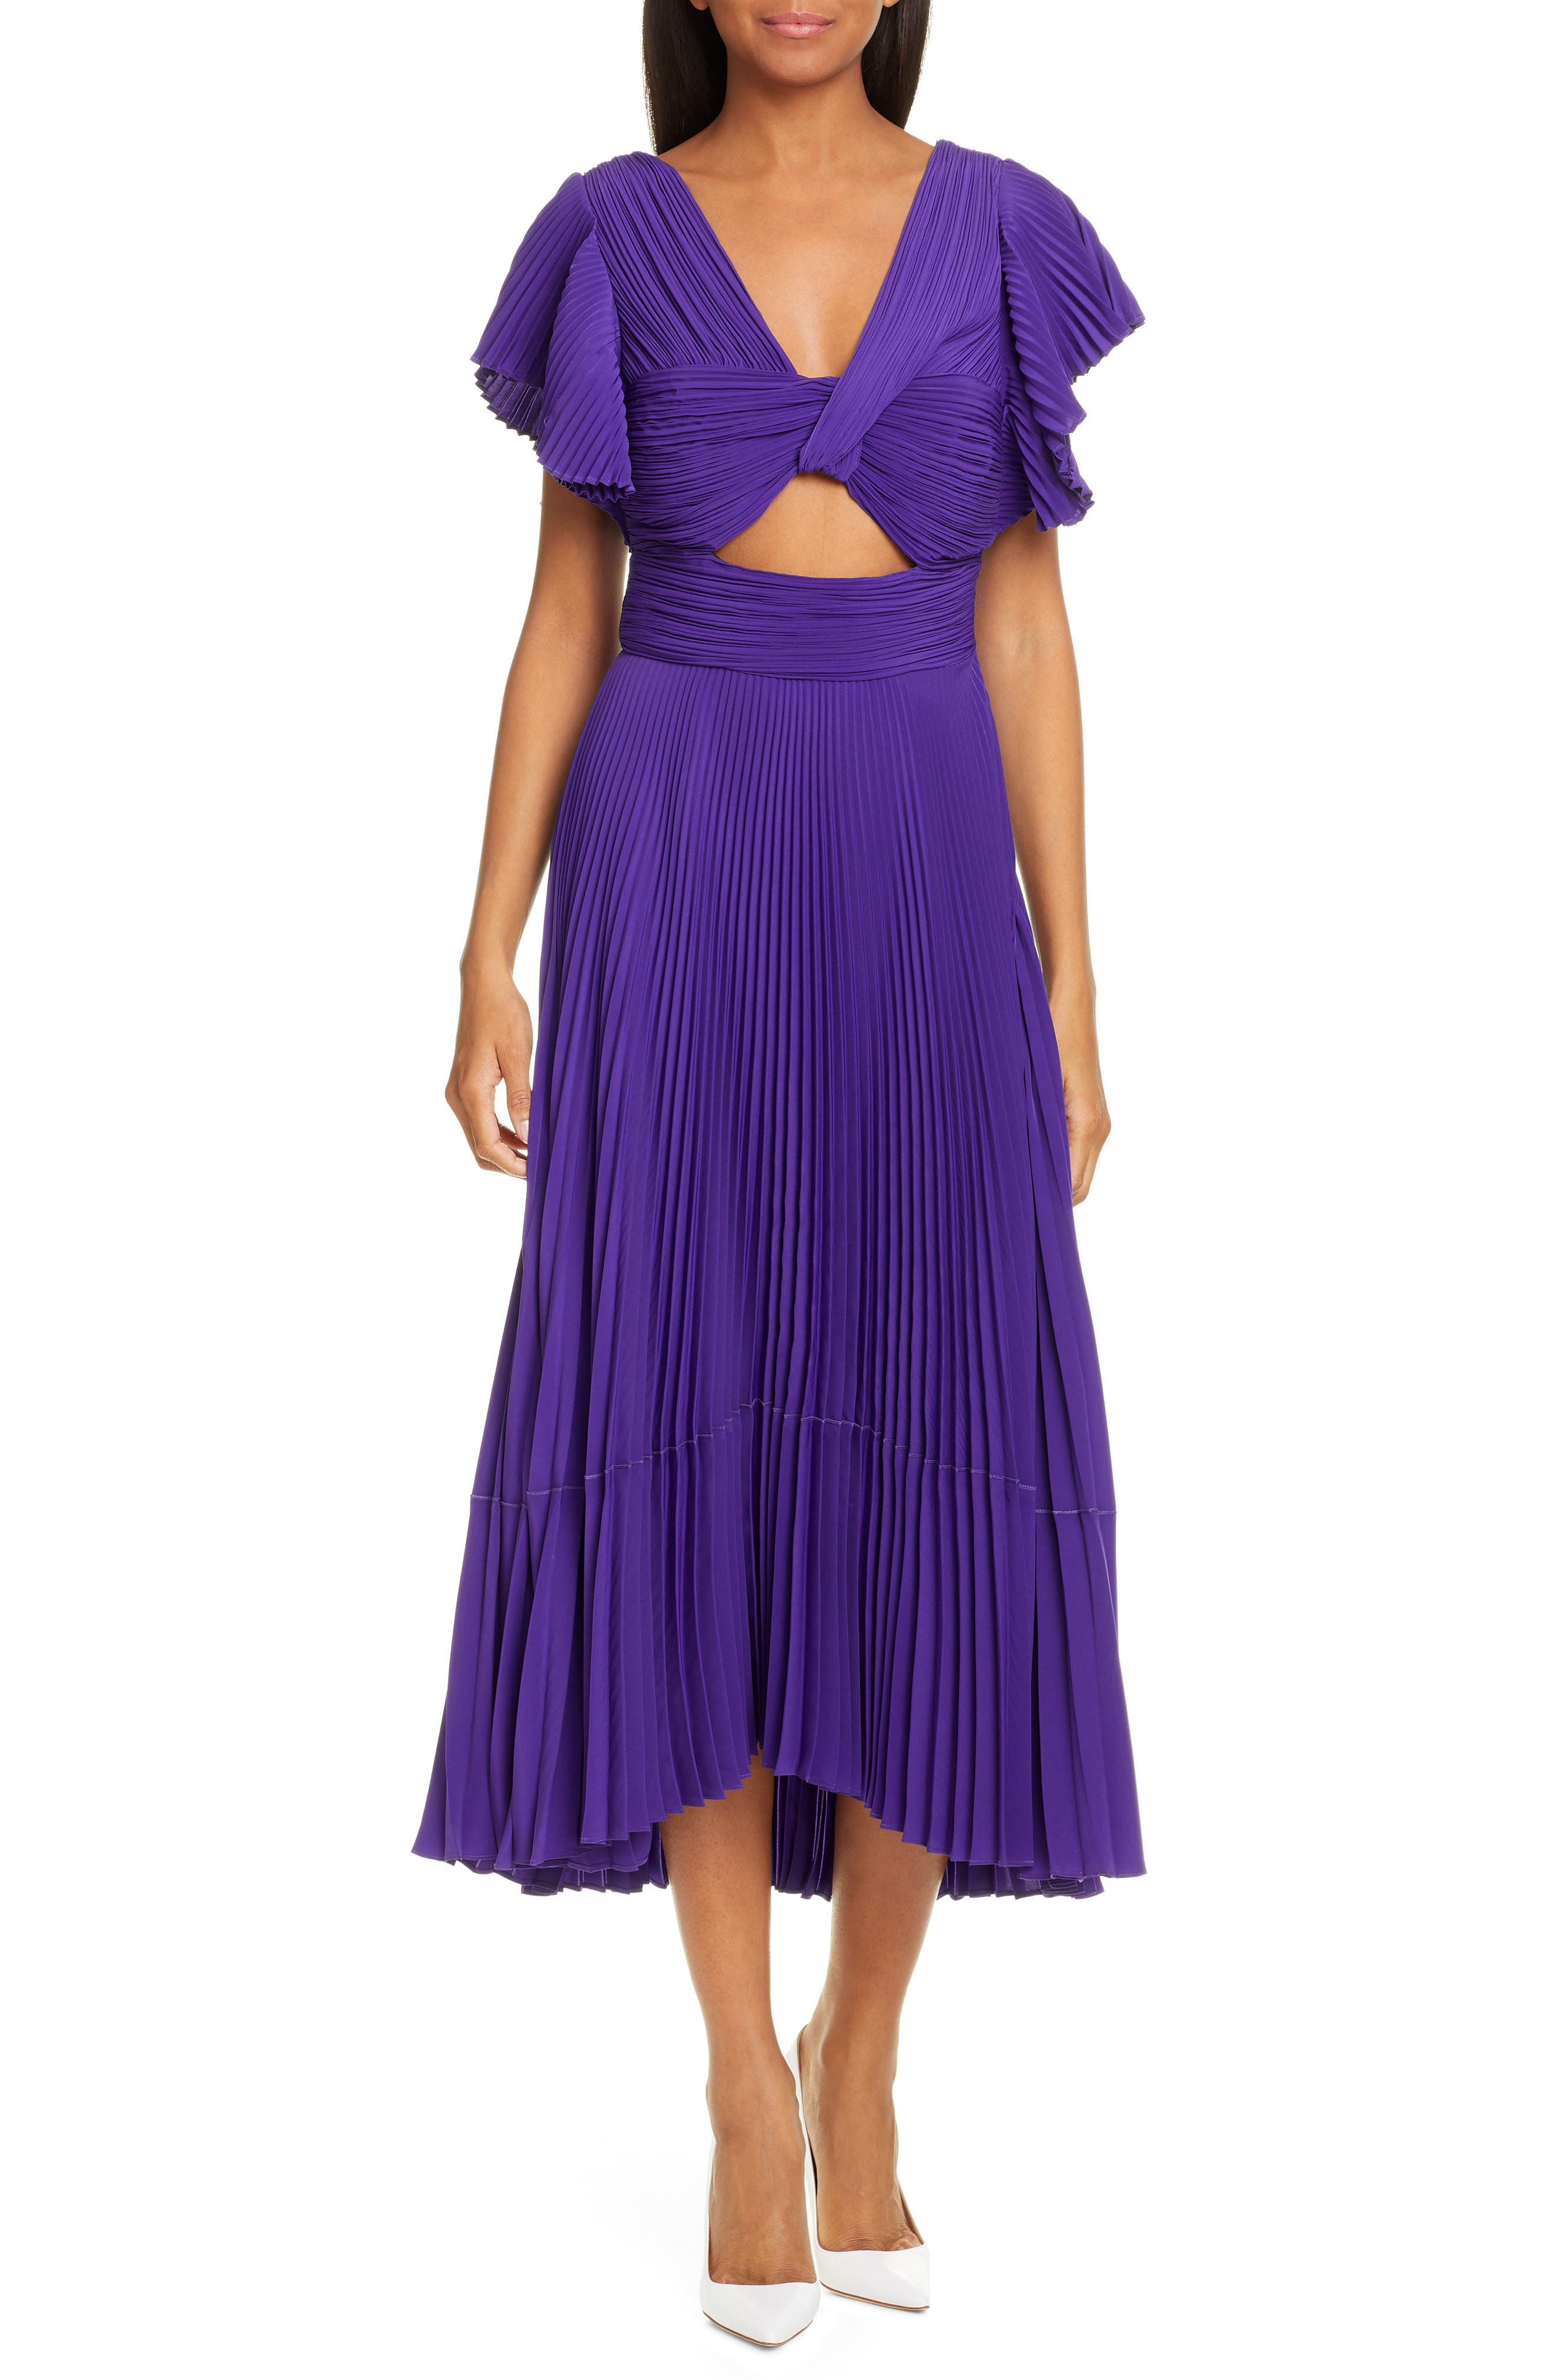 A.l.c. Sorrento Midi Dress, Purple